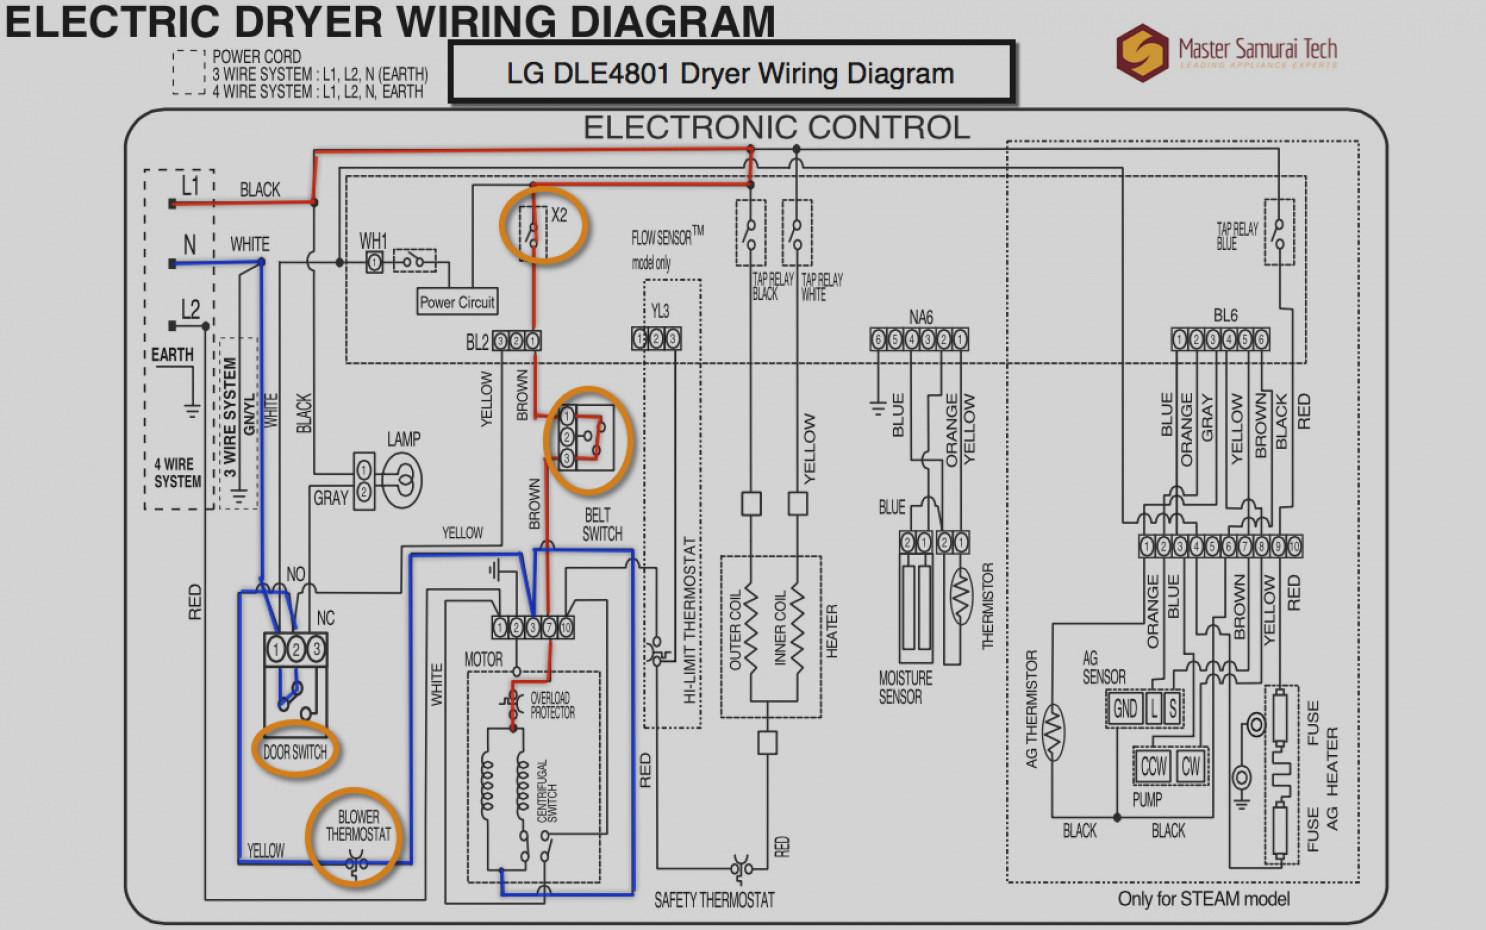 Whirlpool Duet Dryer Wiring Diagram: Wiring Diagram For Whirlpool Dryer Thermostat Free Download Wiring rh:10.jyue.koreich-media.de,Design